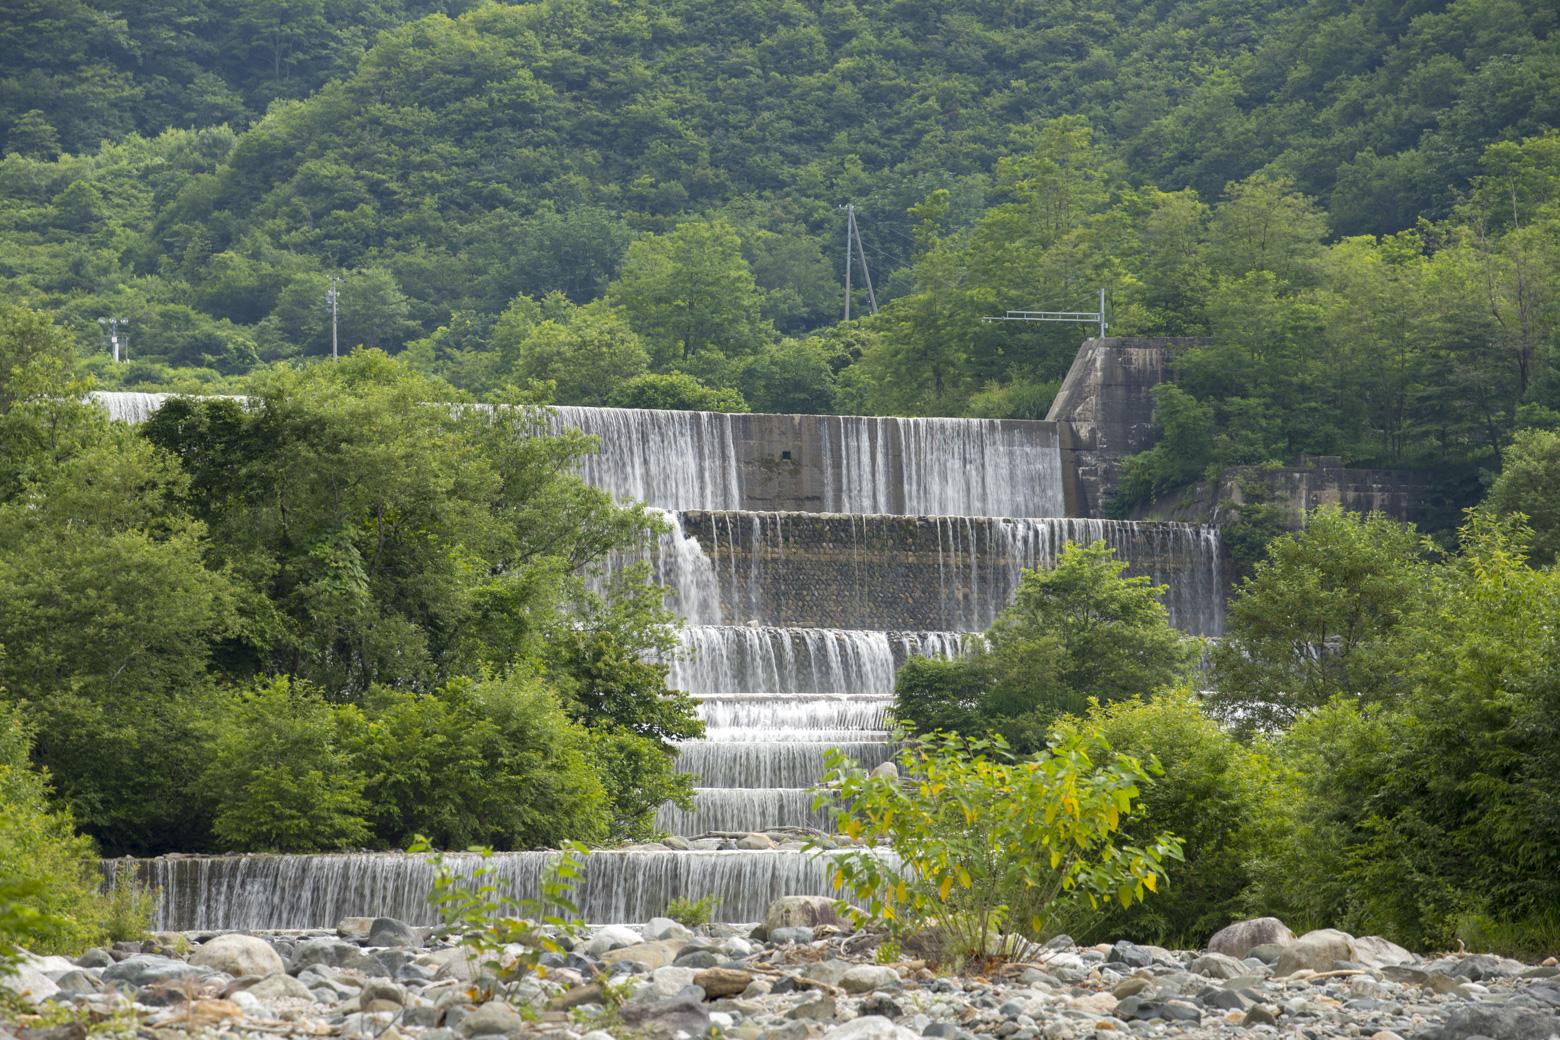 長野県白馬村平川の砂防ダム